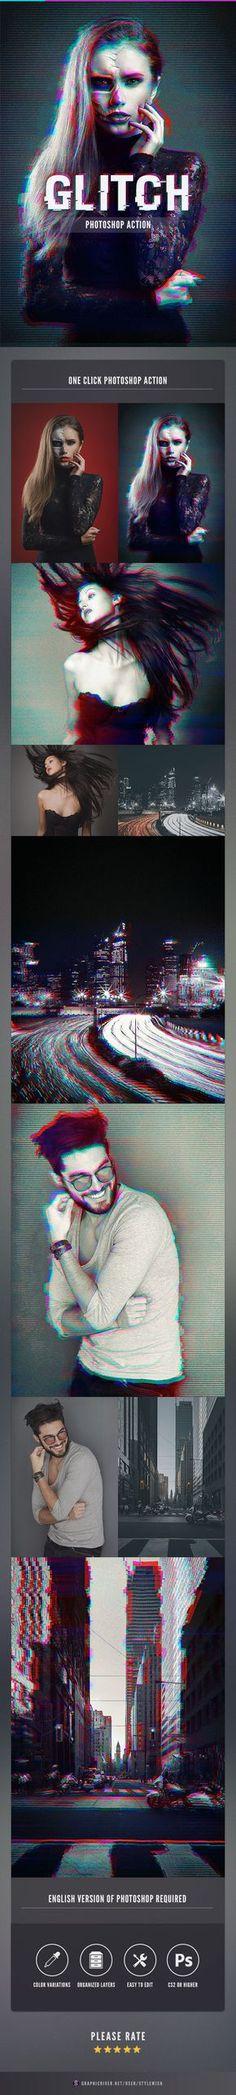 Glitch Photoshop Action - Download…